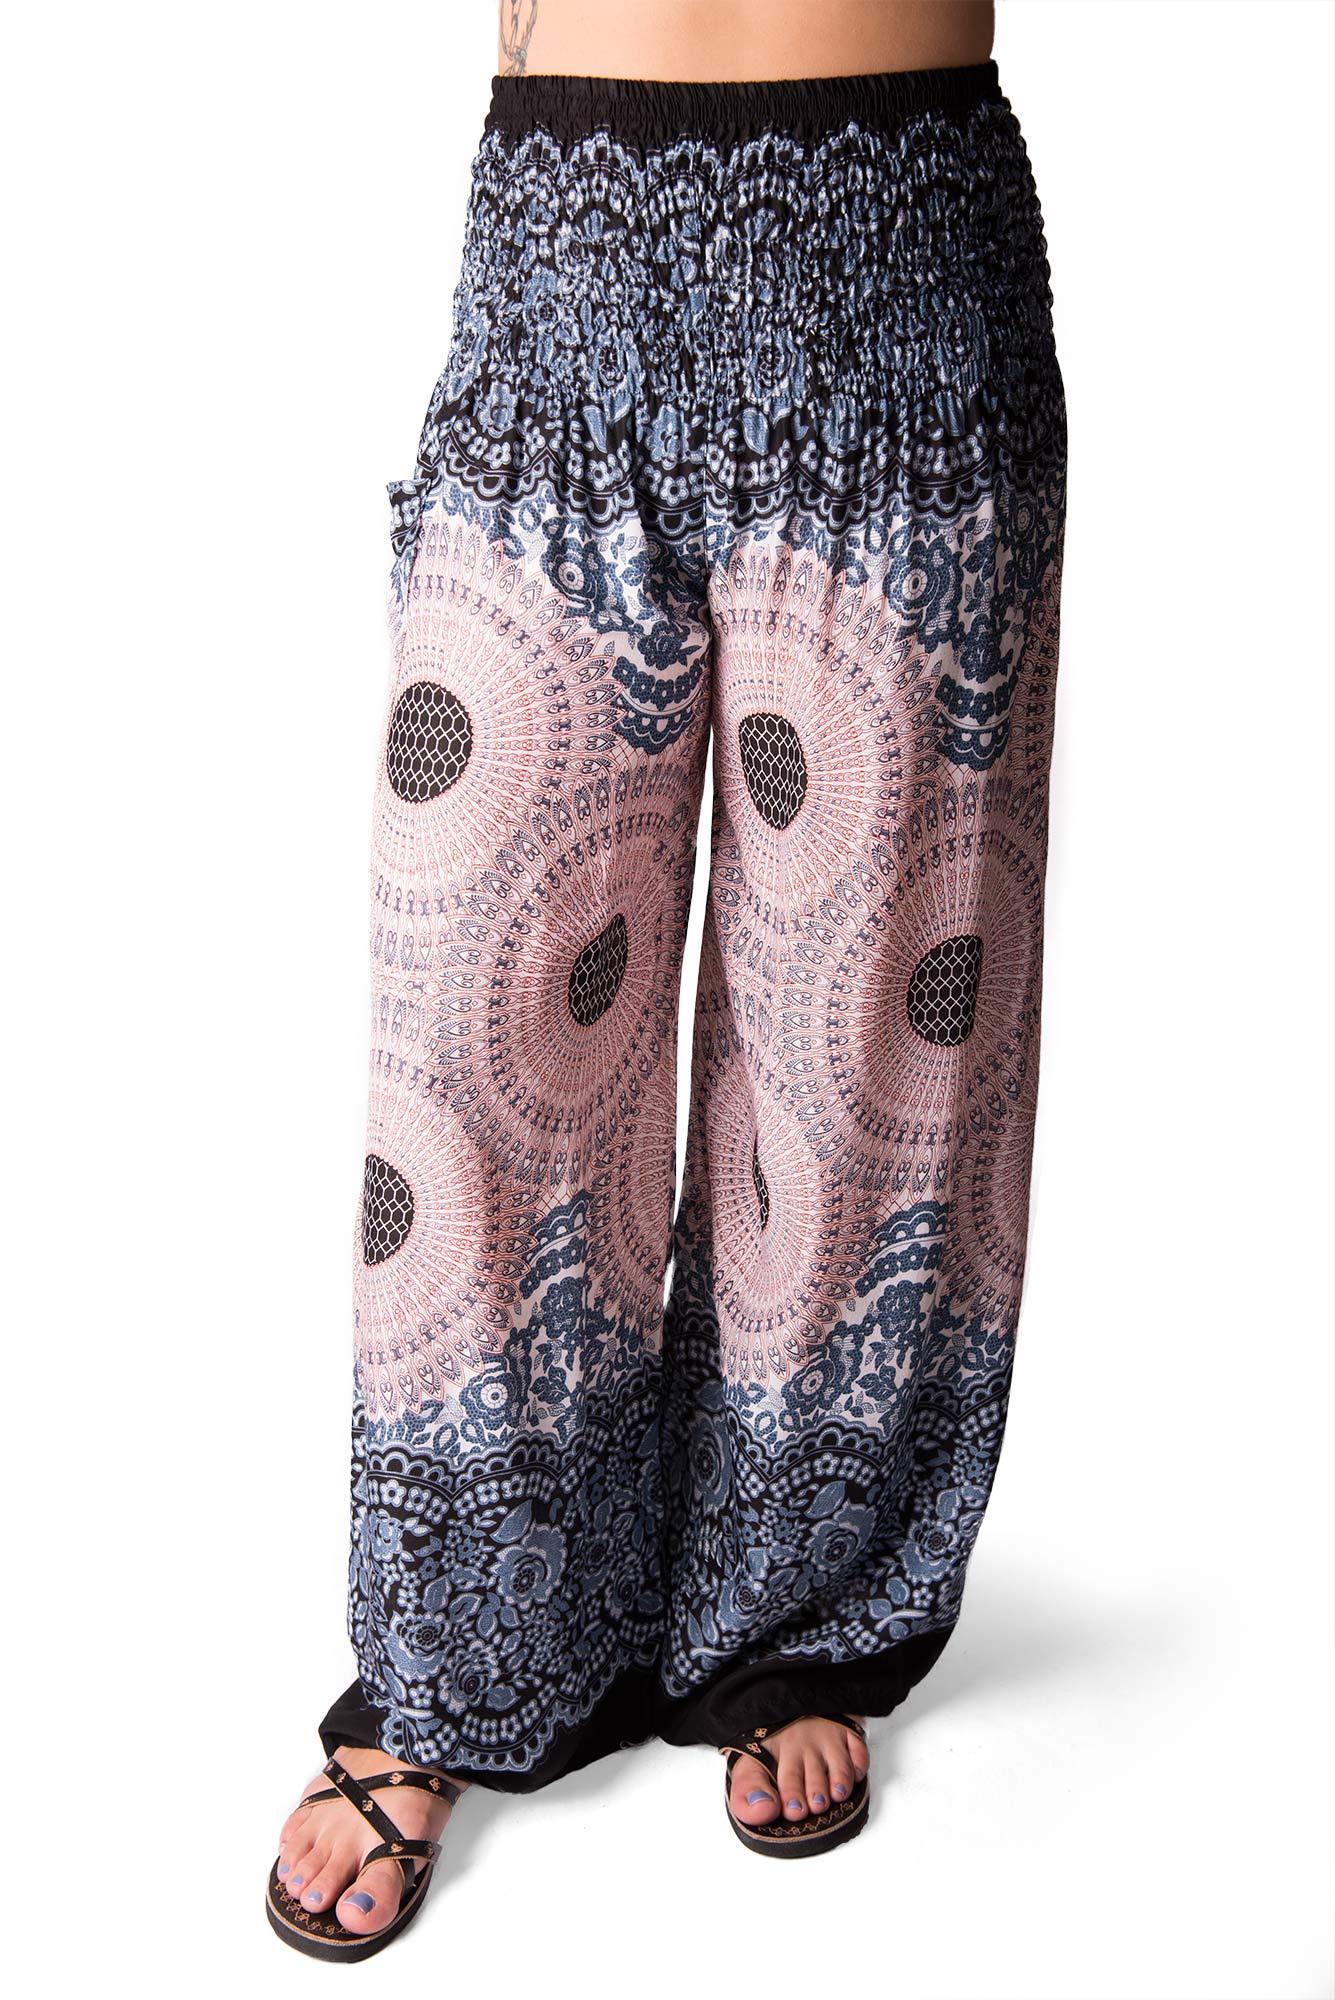 Wide Leg Pants Honeycomb Print, Grey - 3292Y